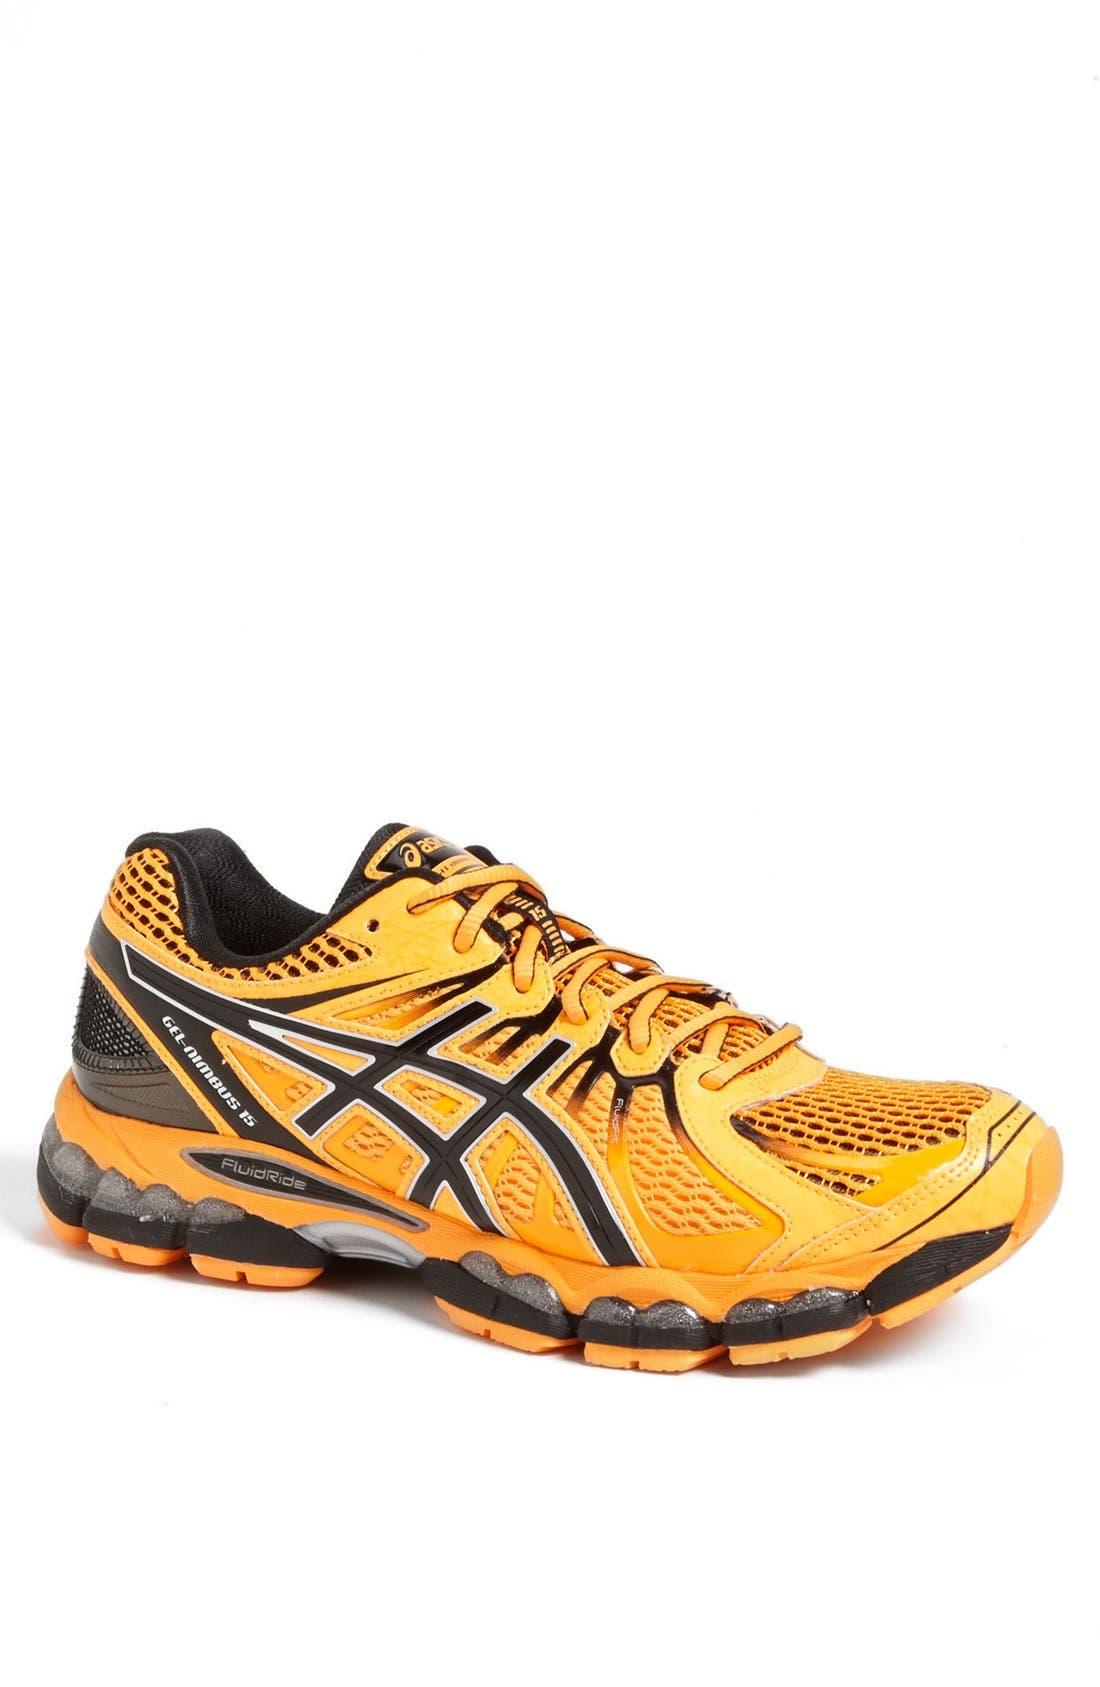 Main Image - ASICS® 'GEL-Nimbus 15' Running Shoe (Men)